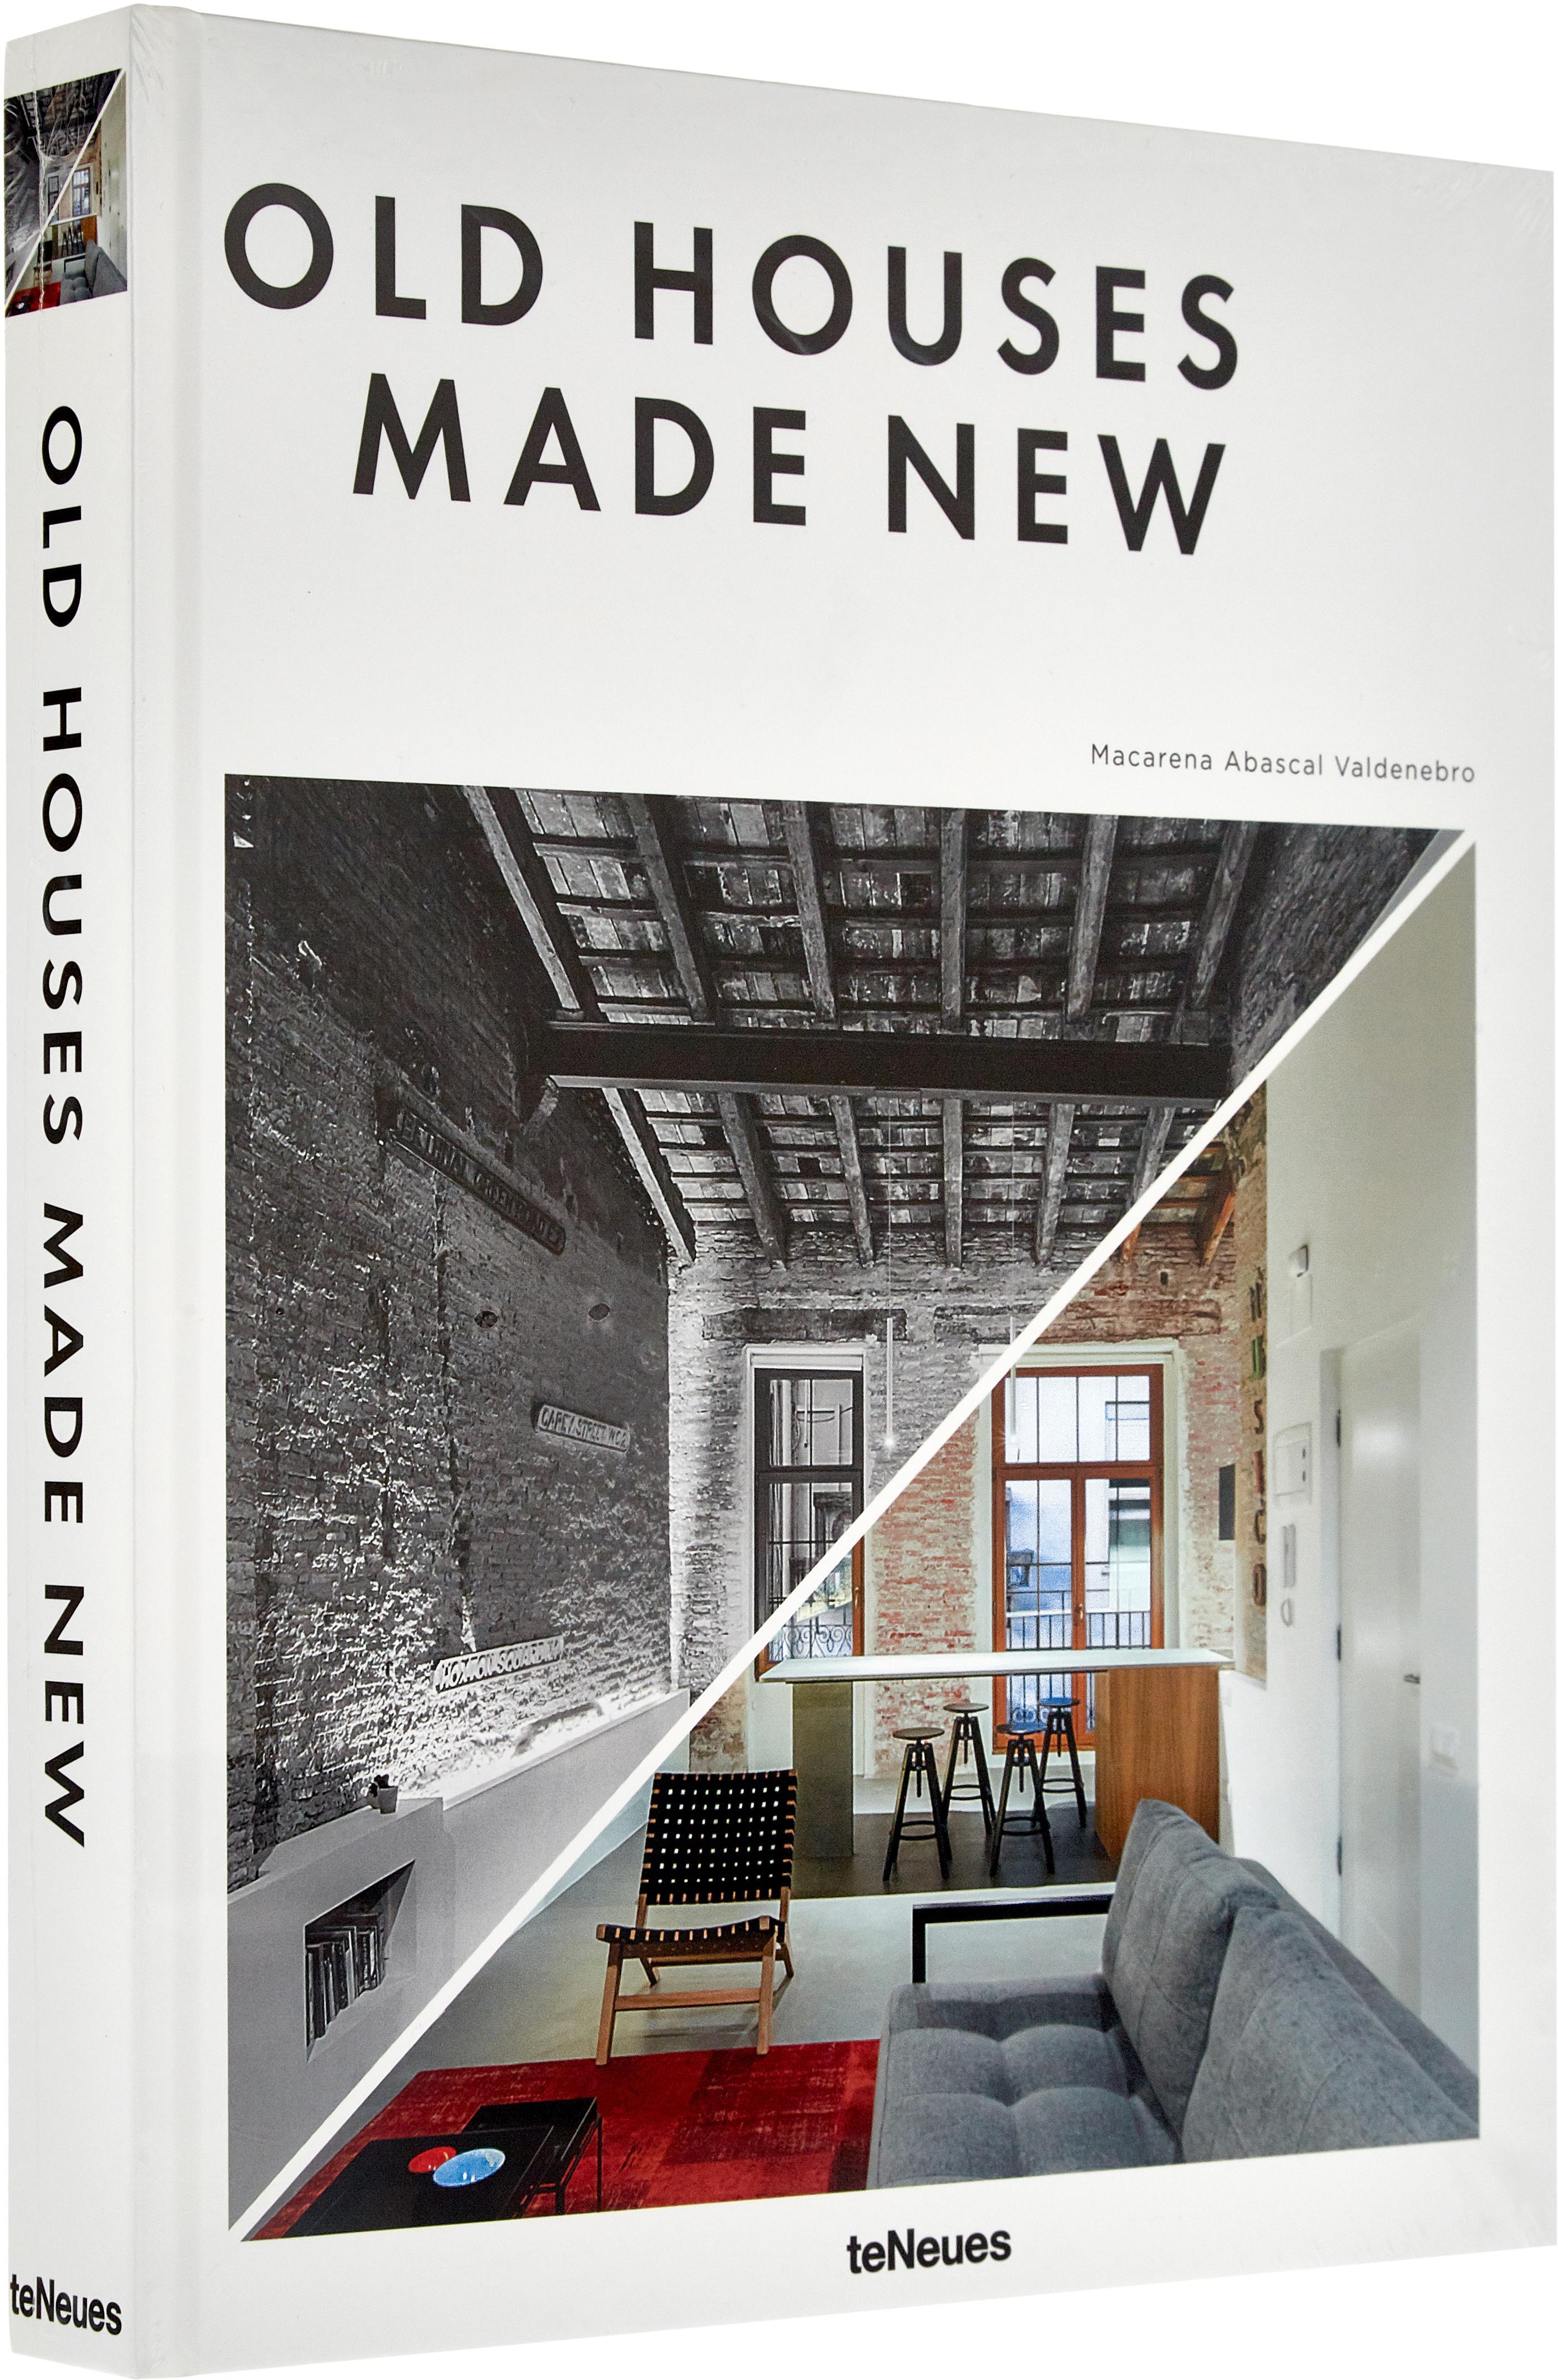 Libro ilustrado Old Houses Made New, Papel, tapa dura, Multicolor, L 32 x An 25 cm